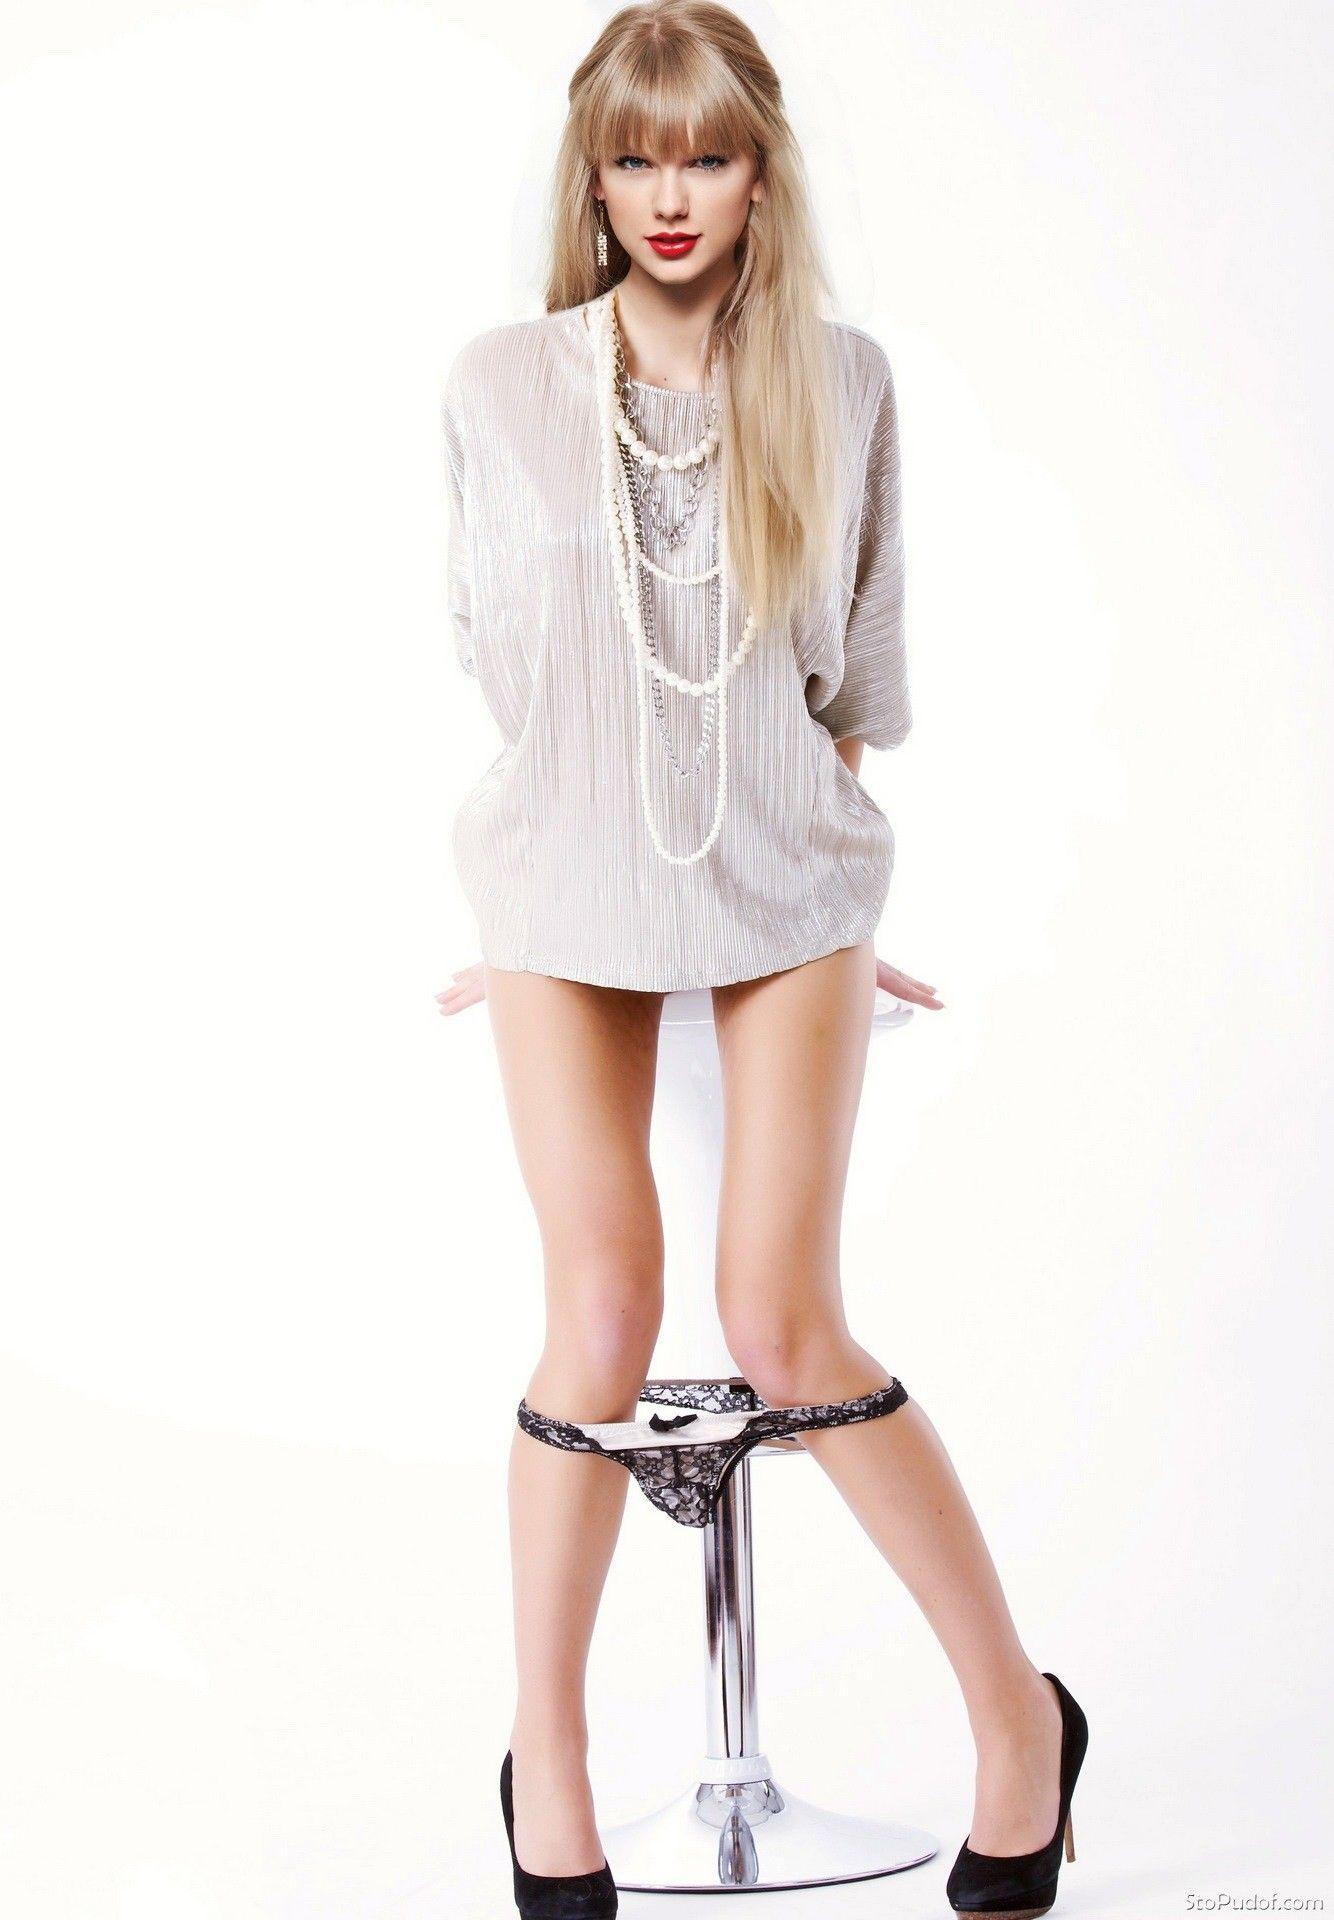 Taylor Swift nude pics photos - UkPhotoSafari